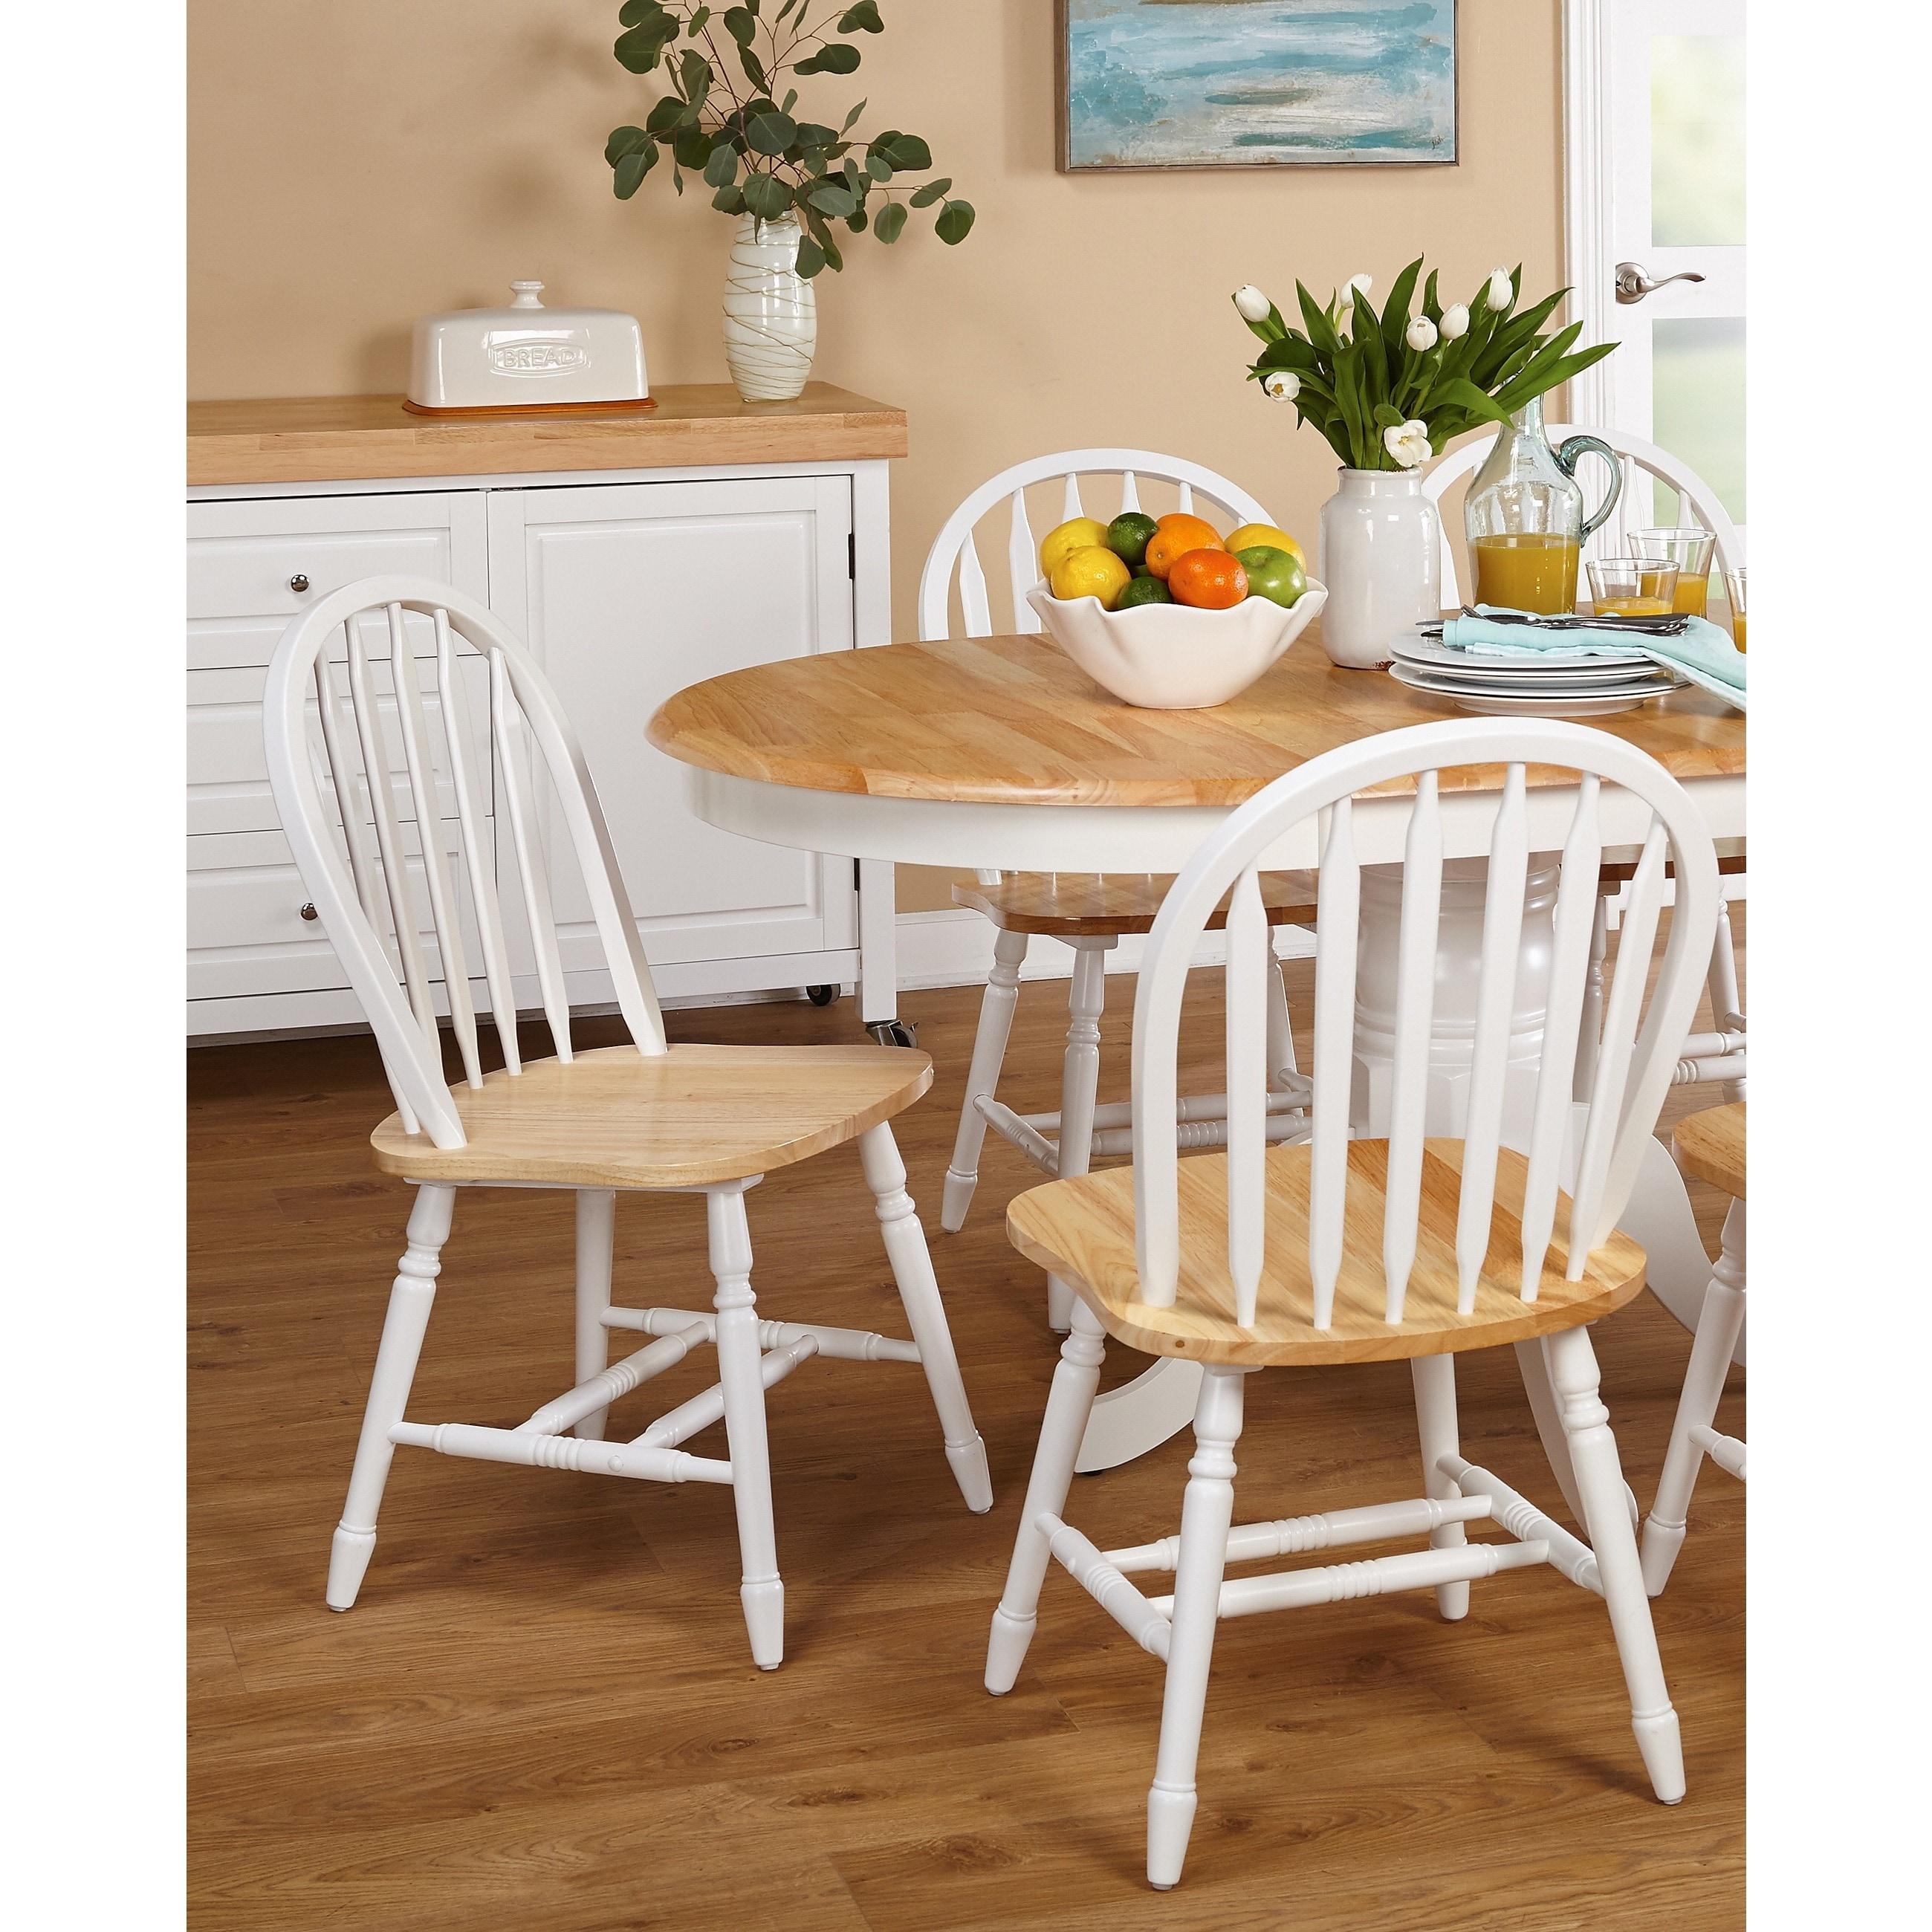 Coastal Dining Chairs Set Windsor Flat Spindle Back Wooden Frame Carved  Legs (2)